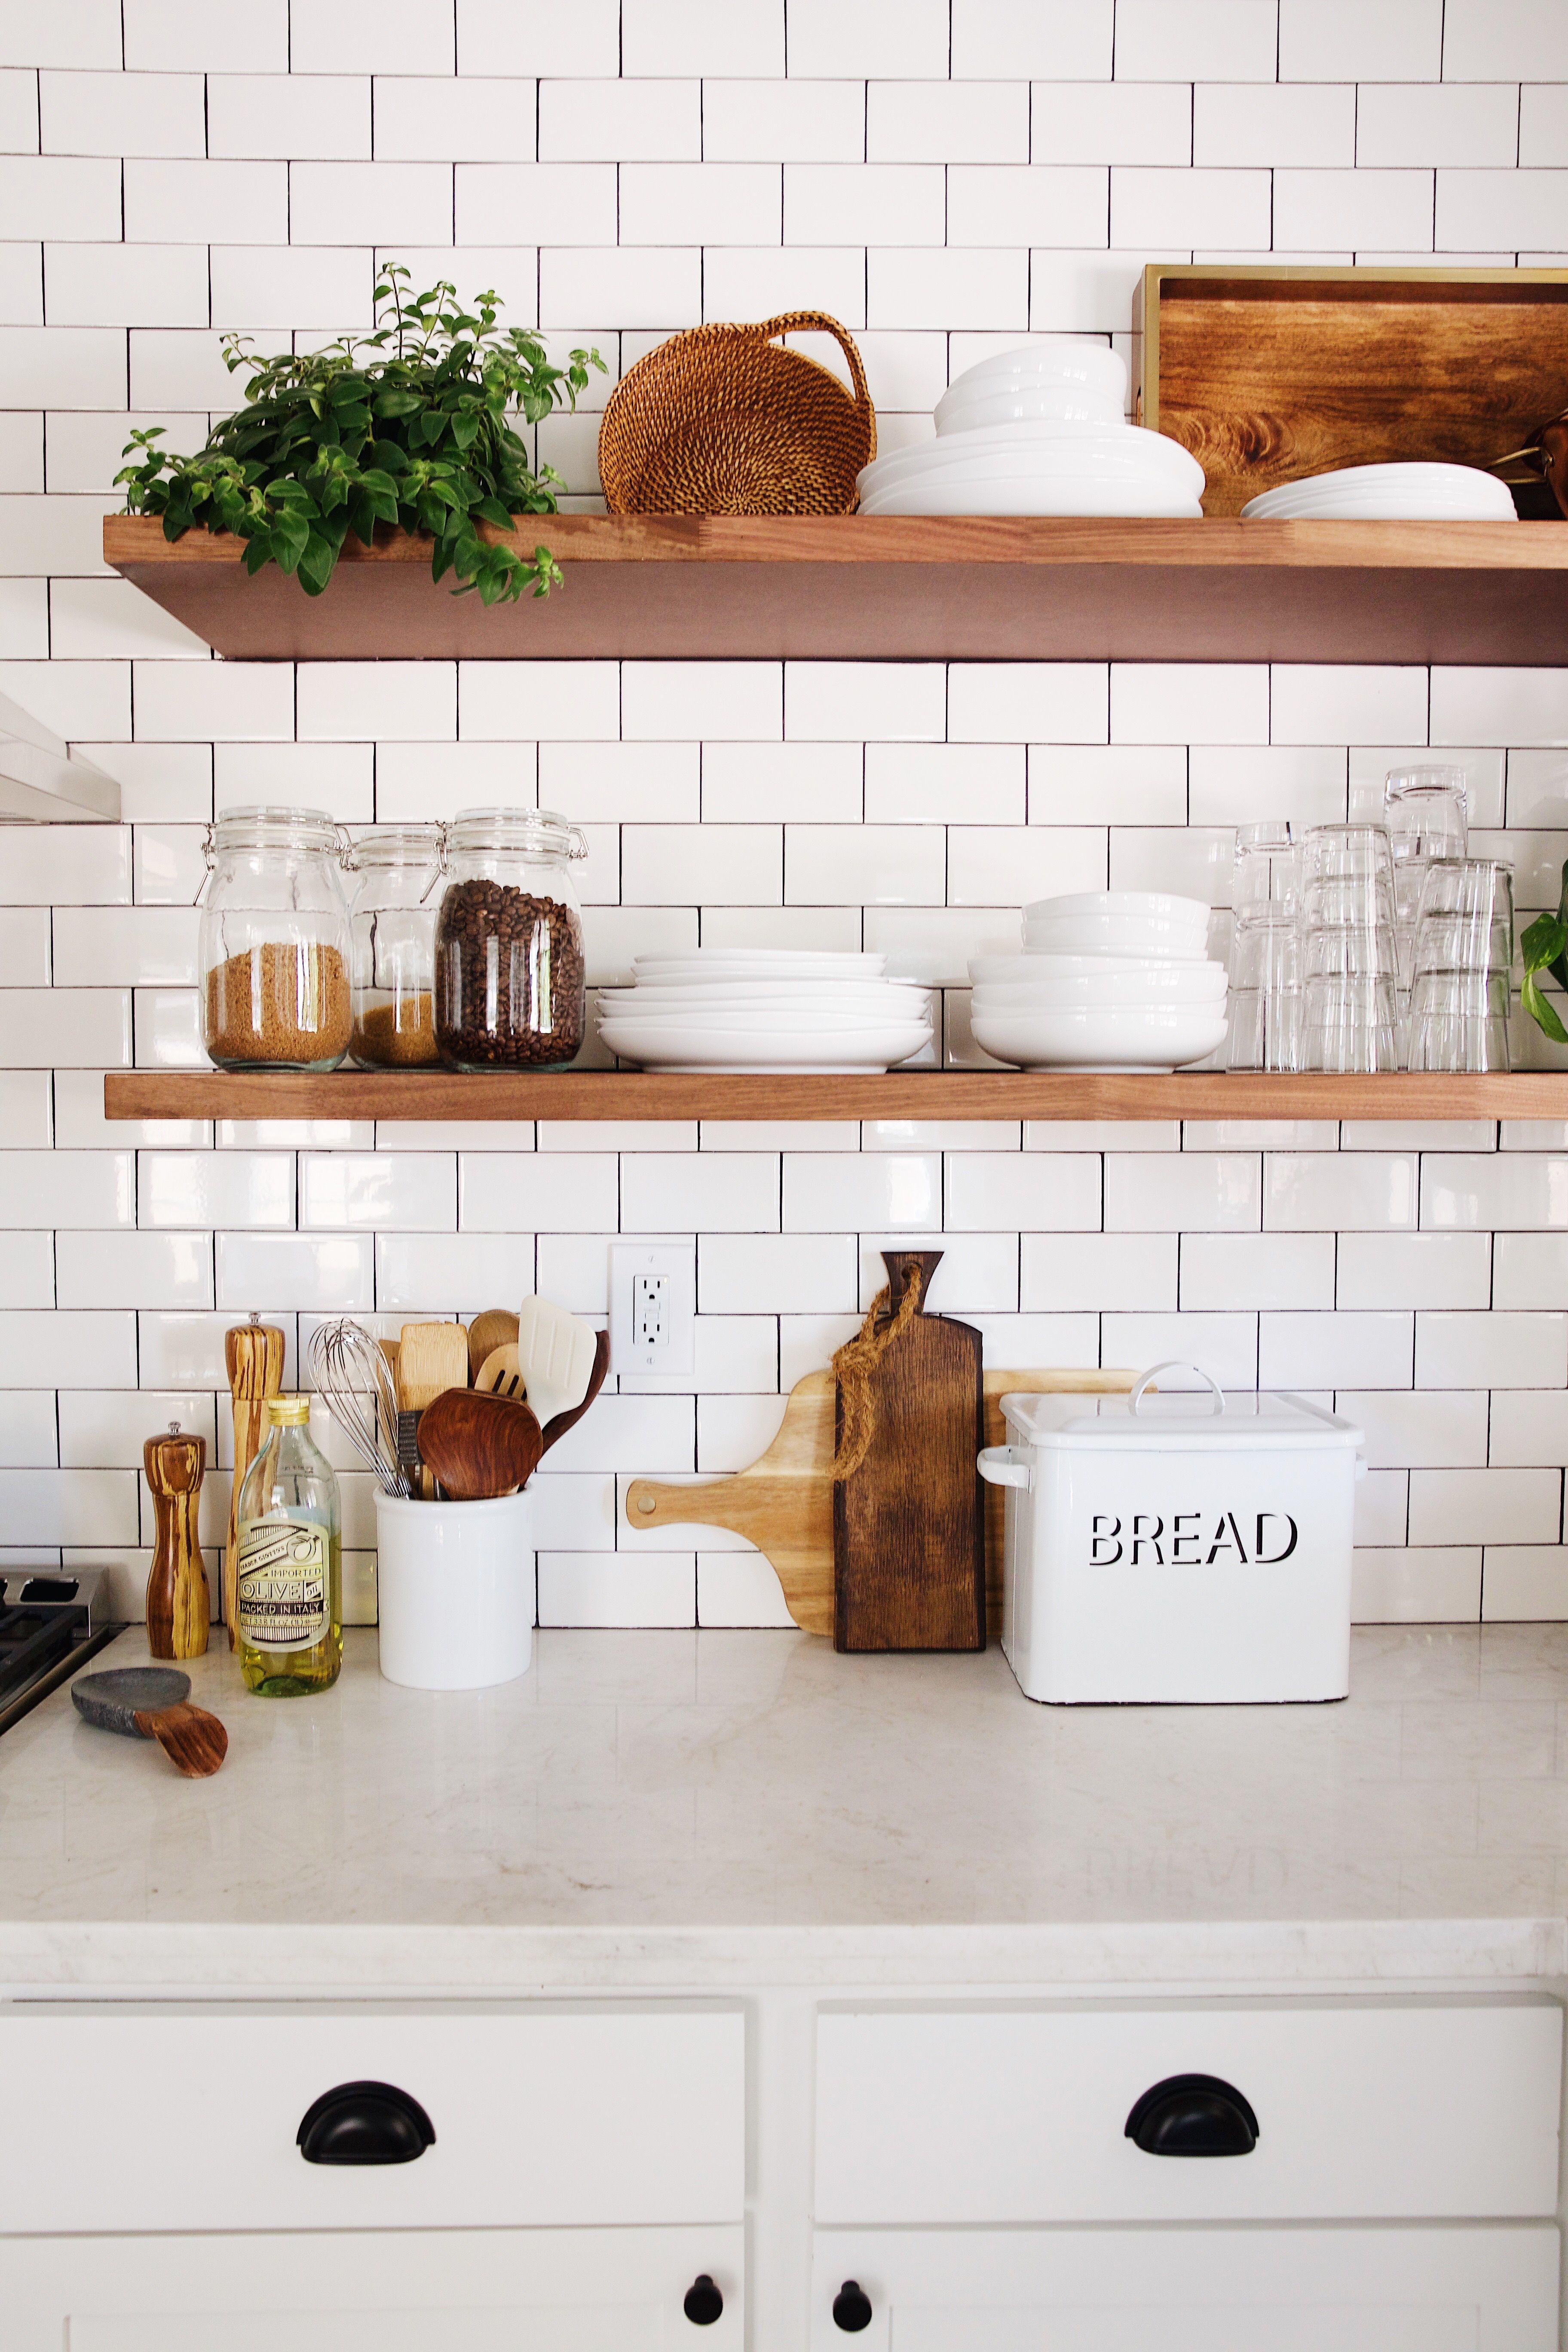 Our Kitchen The Reveal kitchen Pinterest